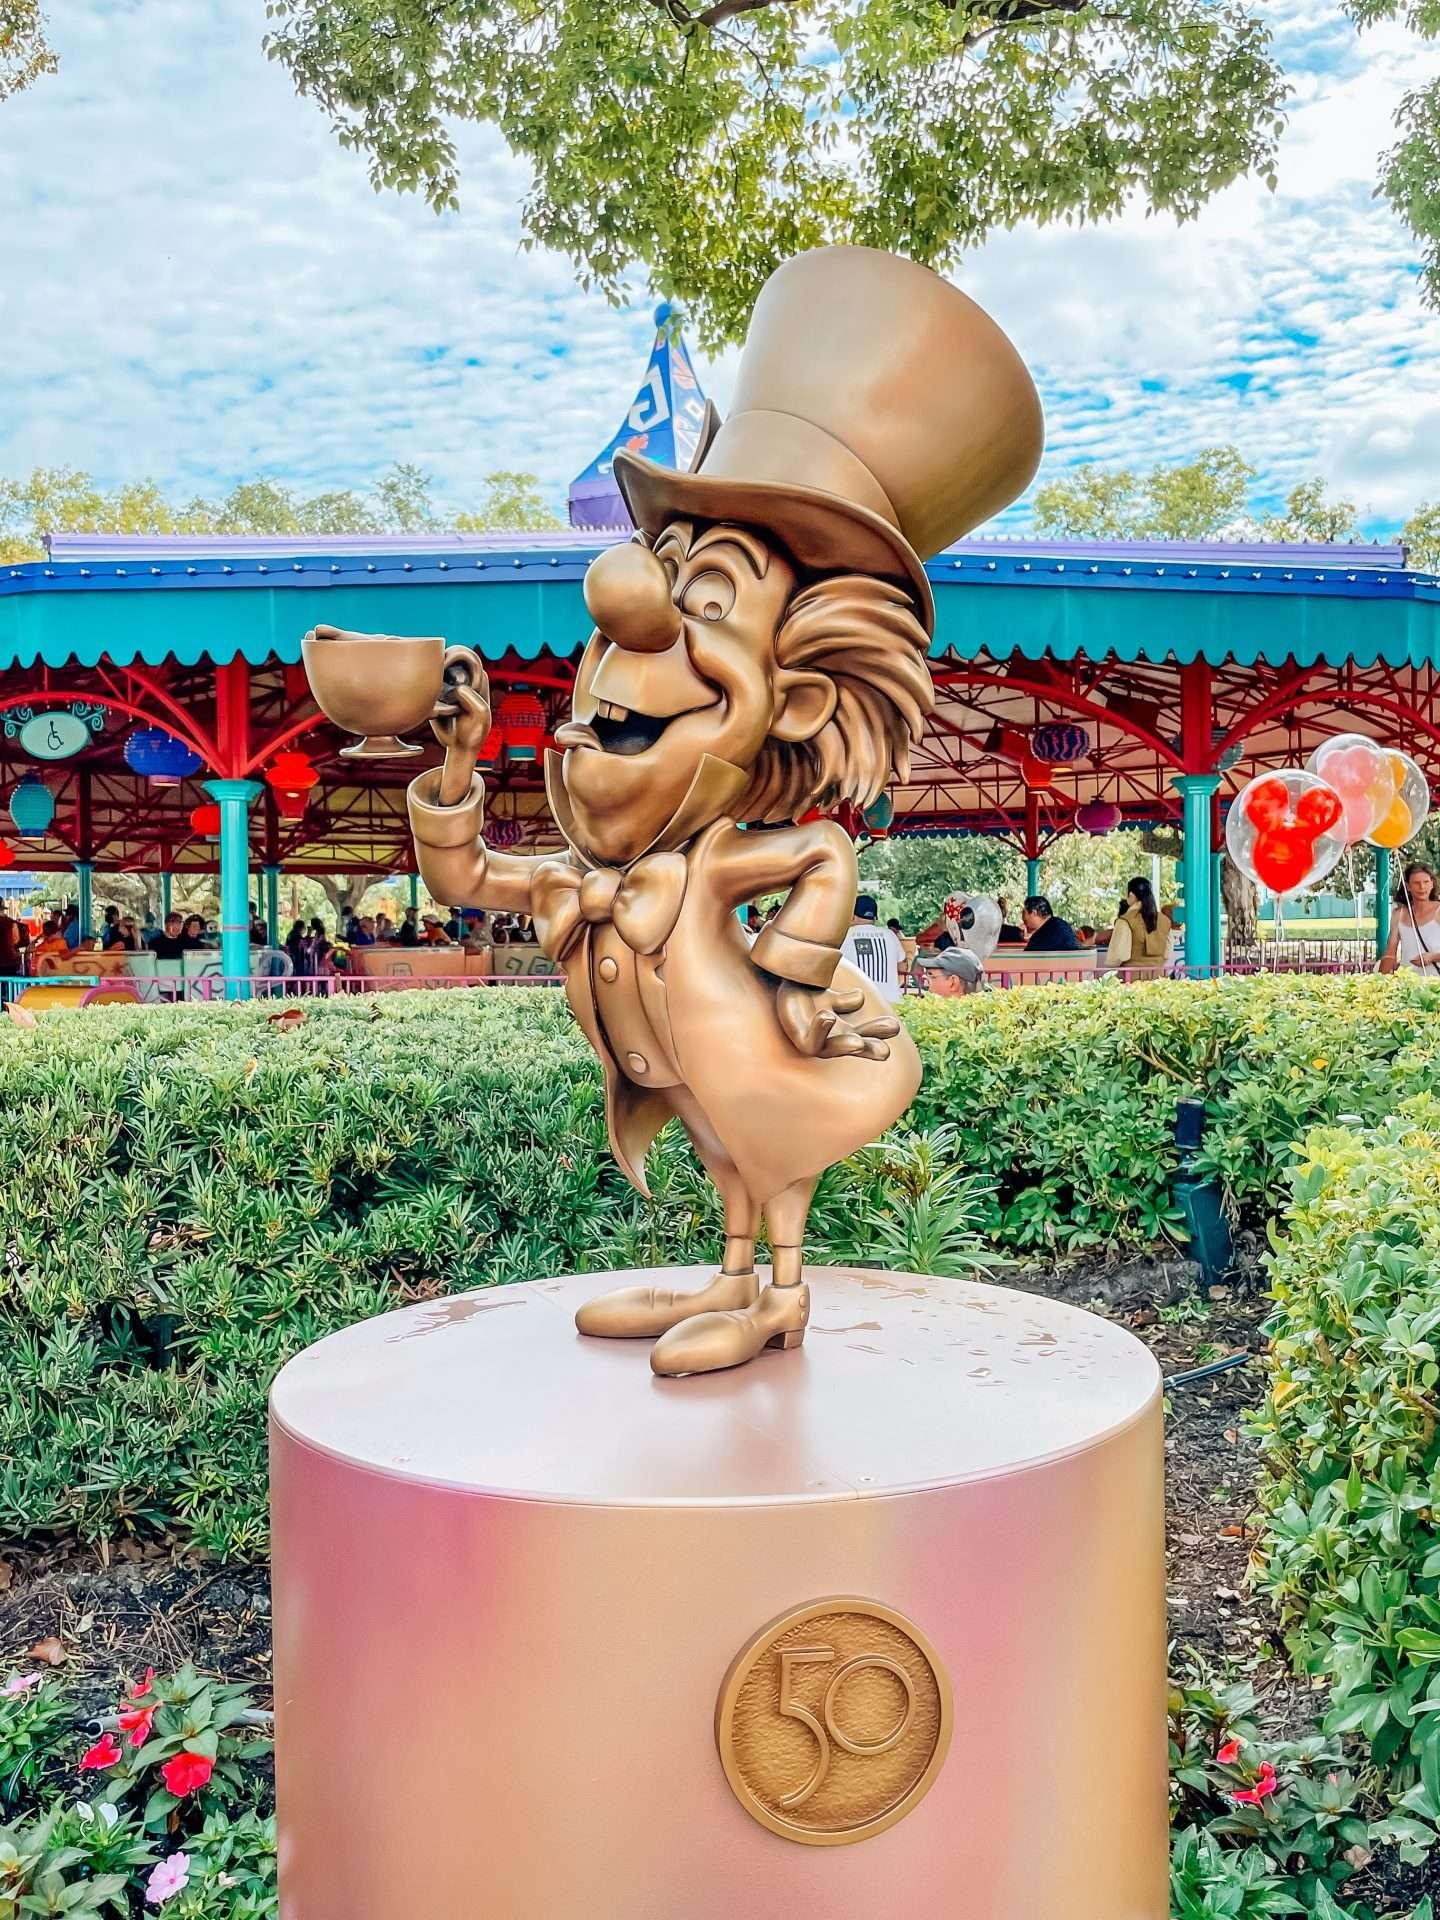 Disney 50th Anniversary statues at Walt Disney World